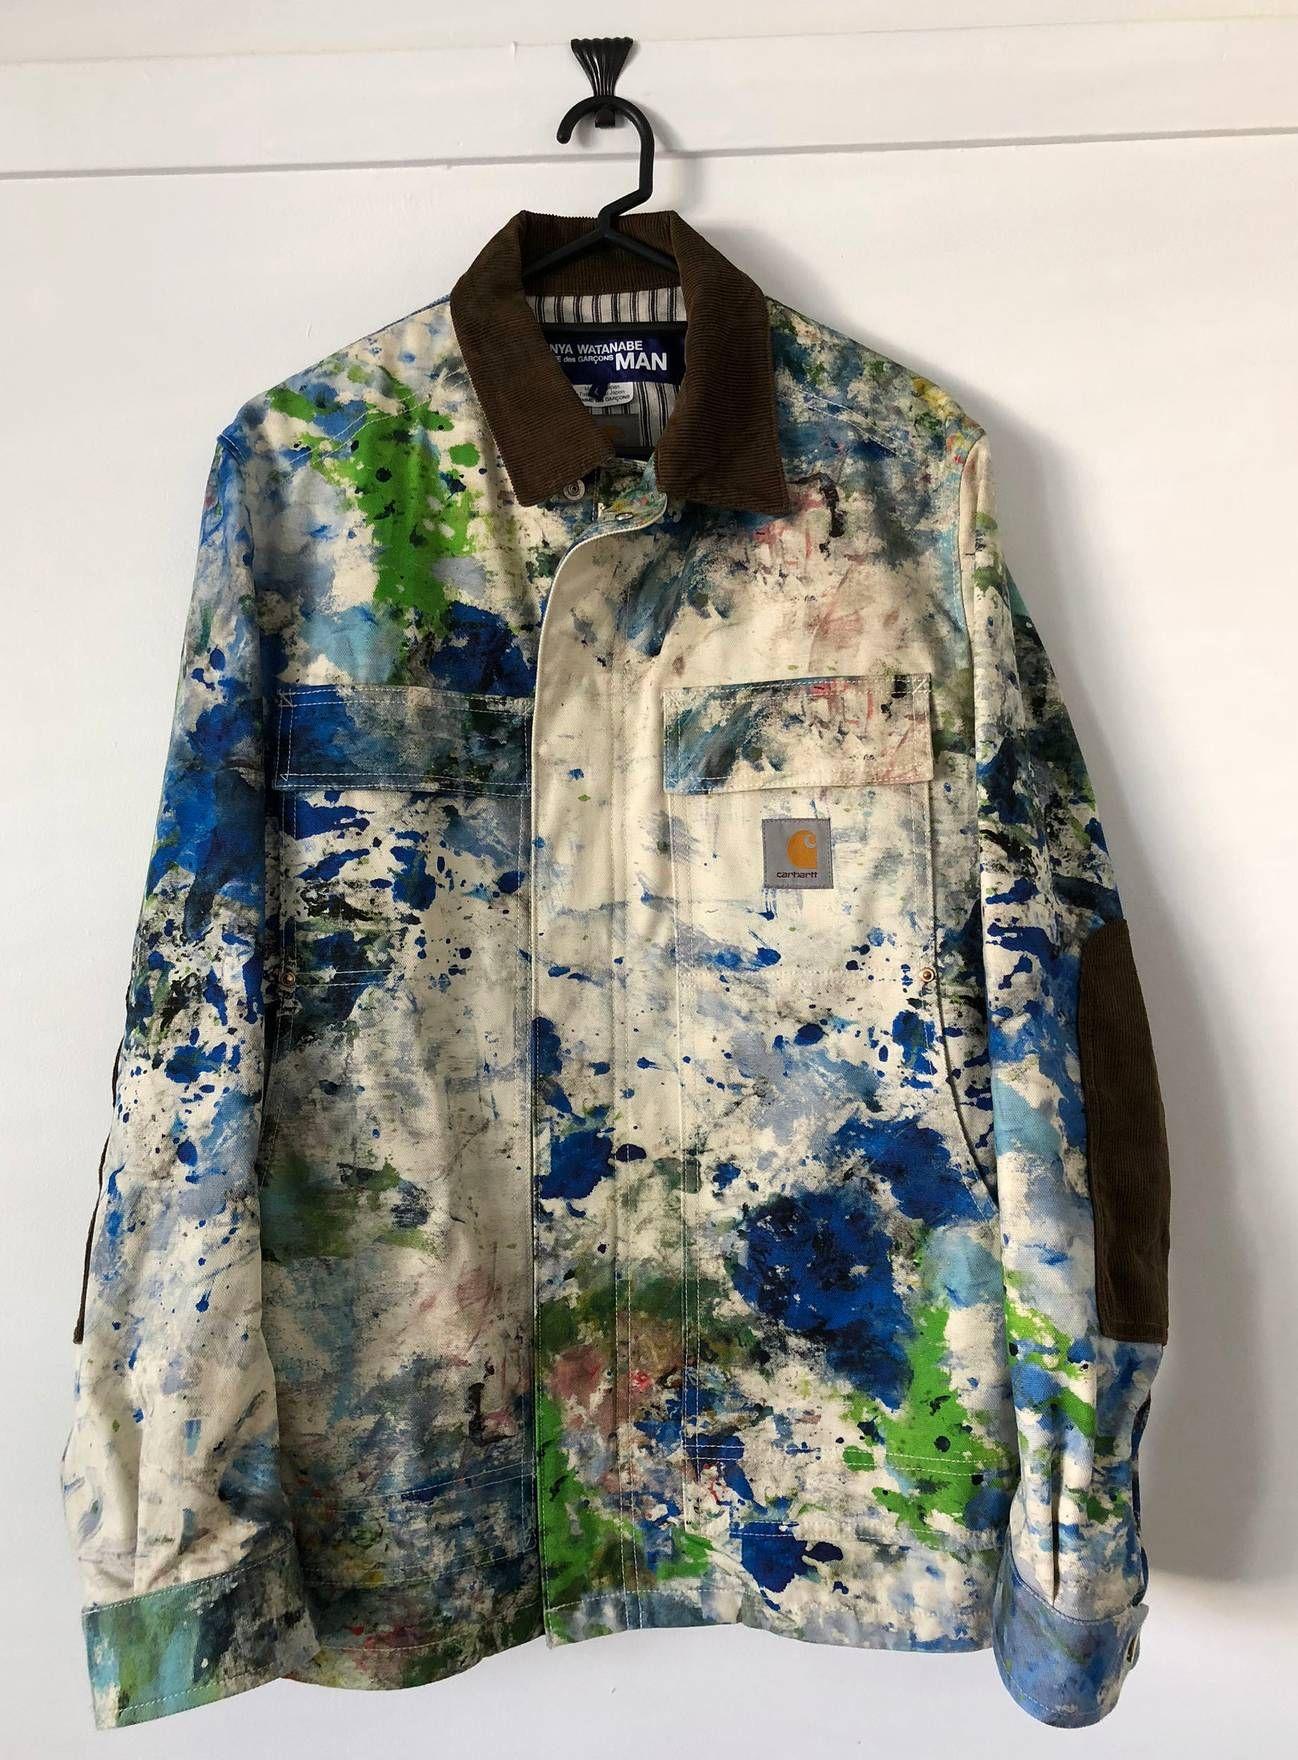 75cd5c8e2a6 Junya Watanabe Junya Watanabe x Carhartt Paint Jacket Size US L / EU 52-54